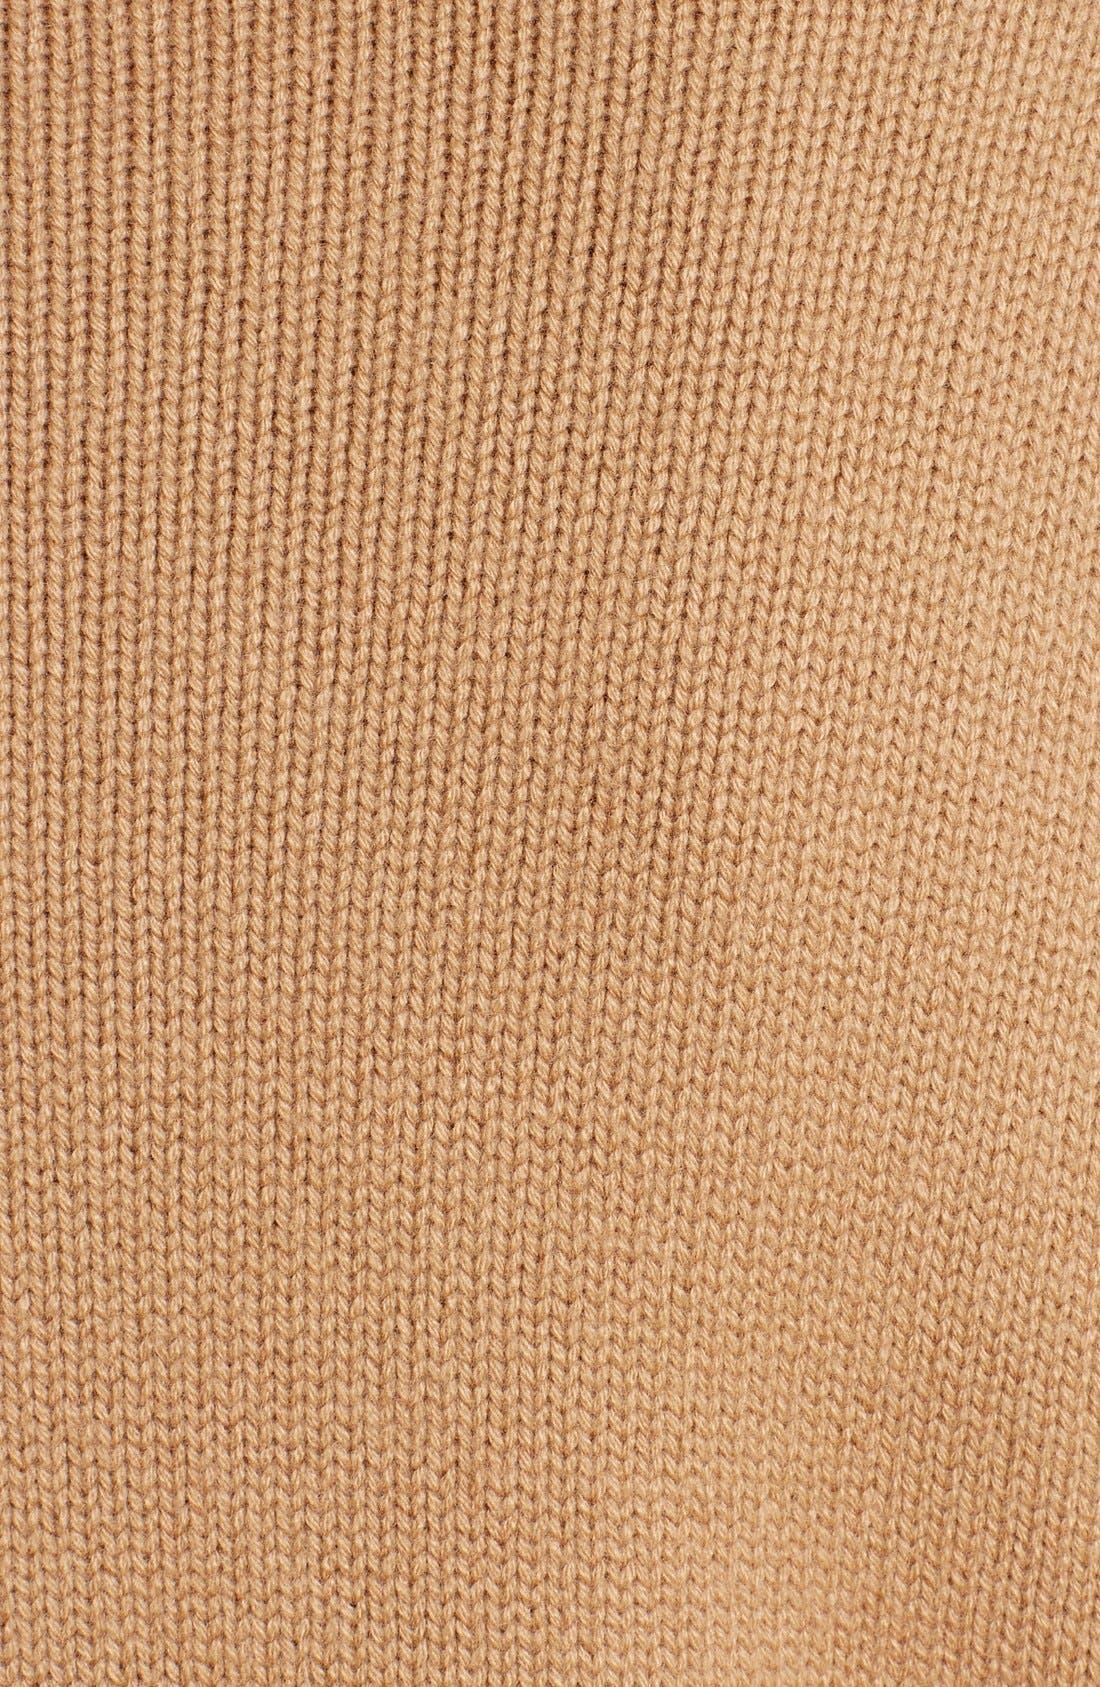 Studded Crewneck Cashmere Sweater,                             Alternate thumbnail 3, color,                             CAMEL